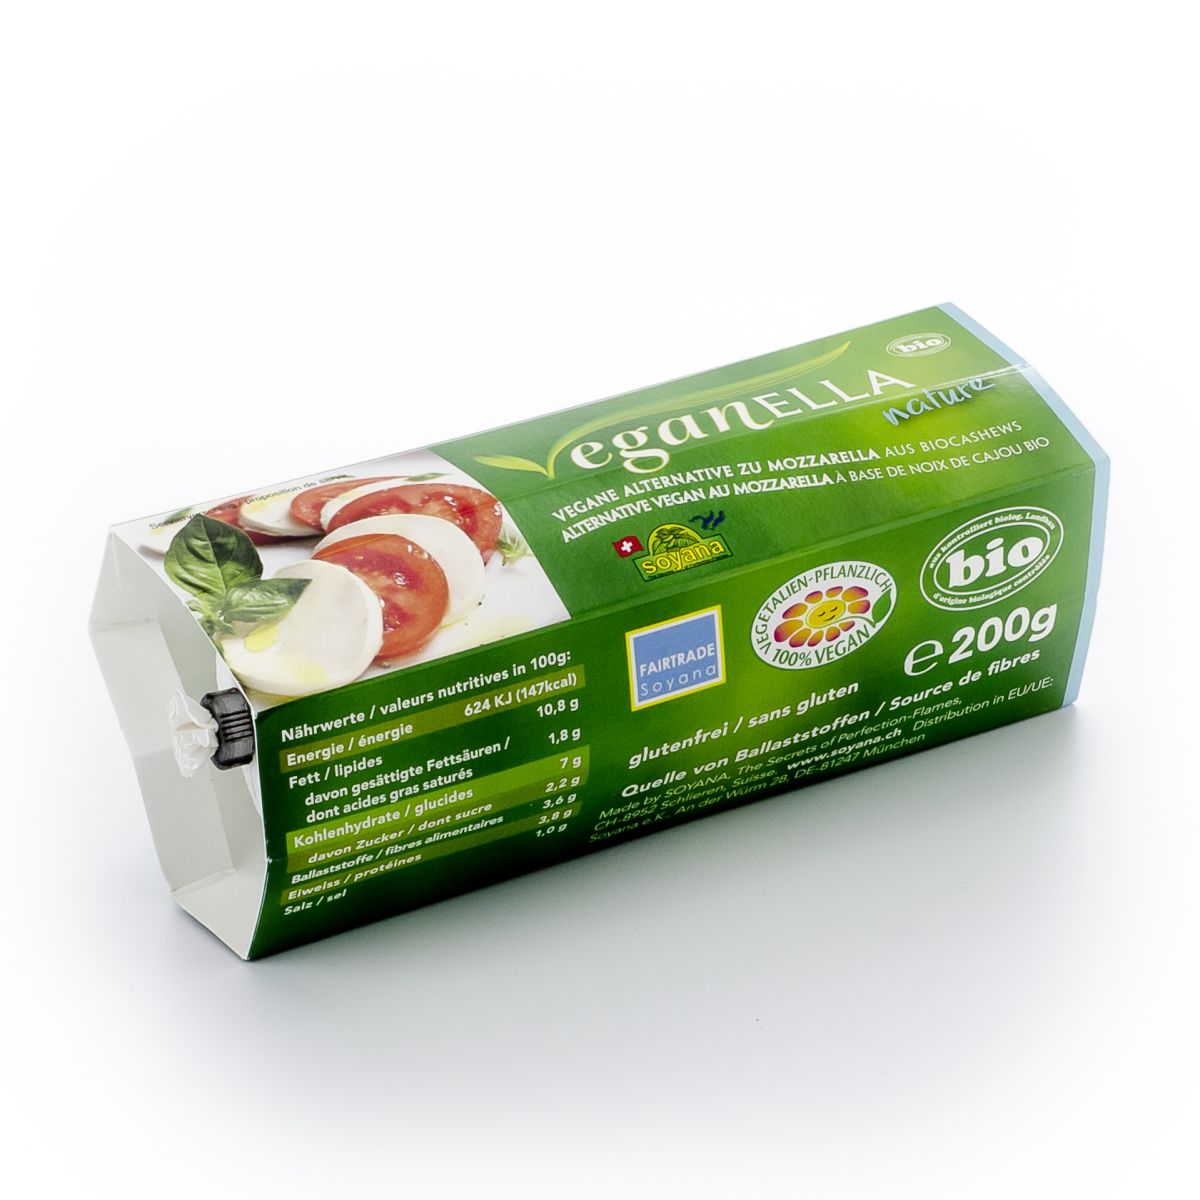 Veganella nature, Mozzarella-Alternative